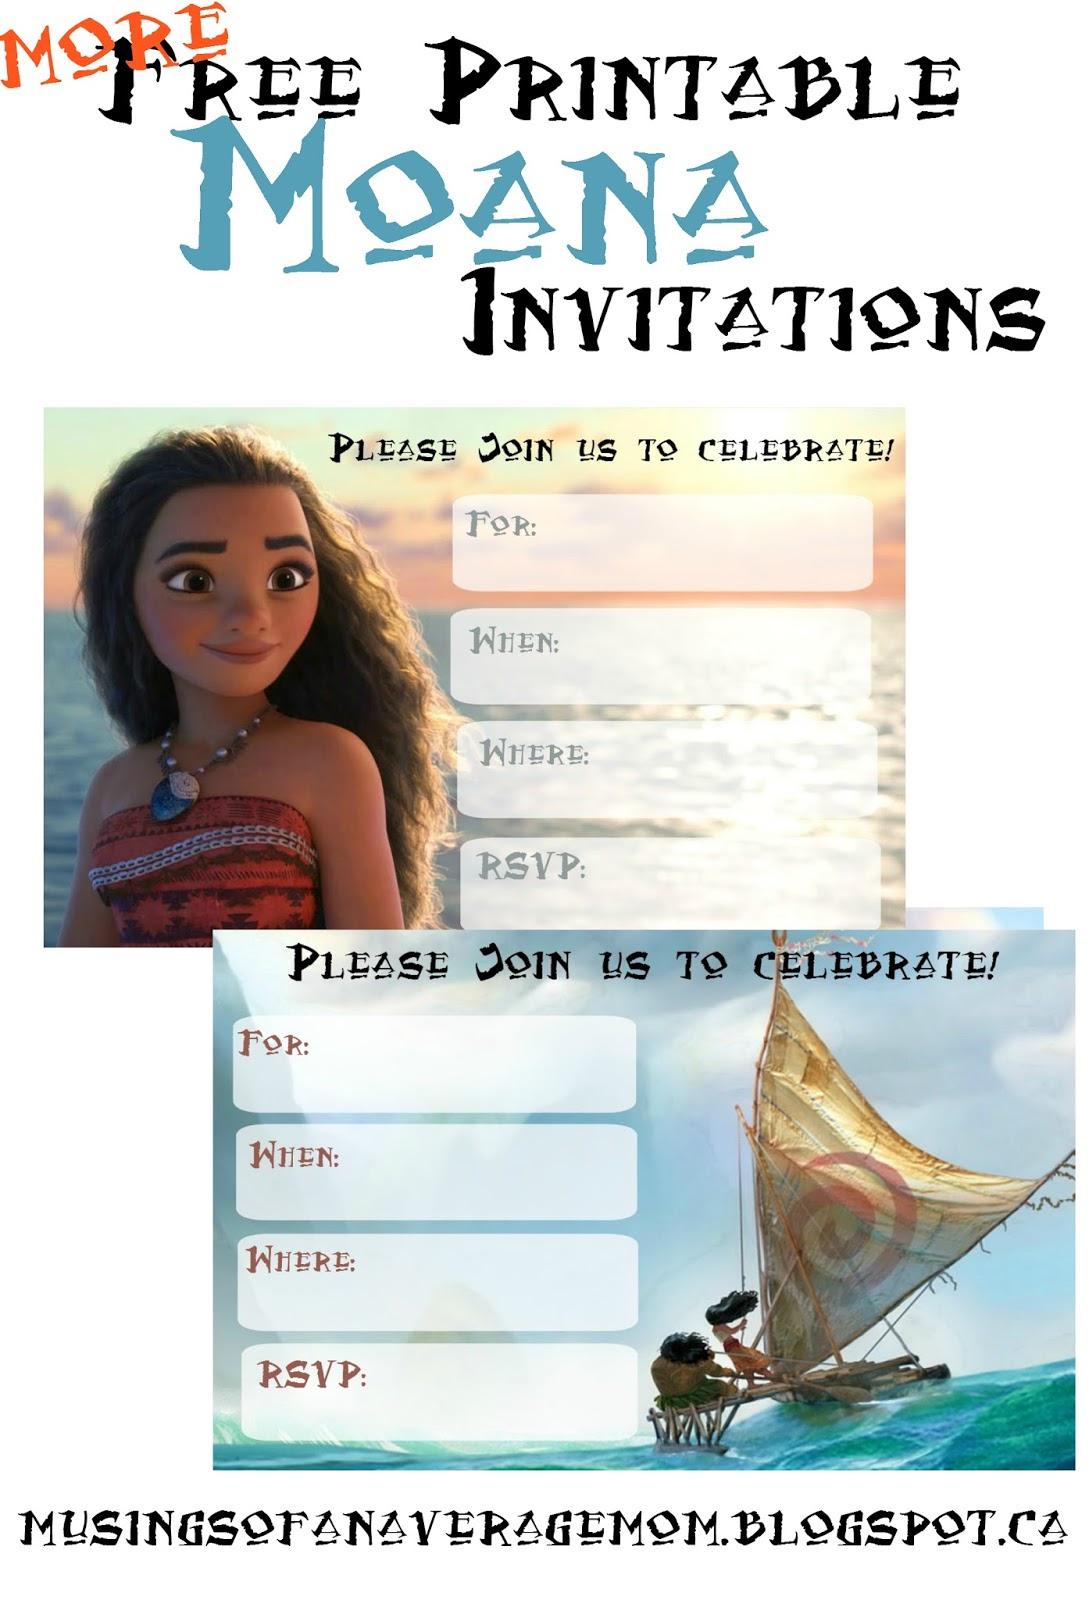 Musings Of An Average Mom: Free Printable Moana Invitations 2 - Free Printable Moana Invitations